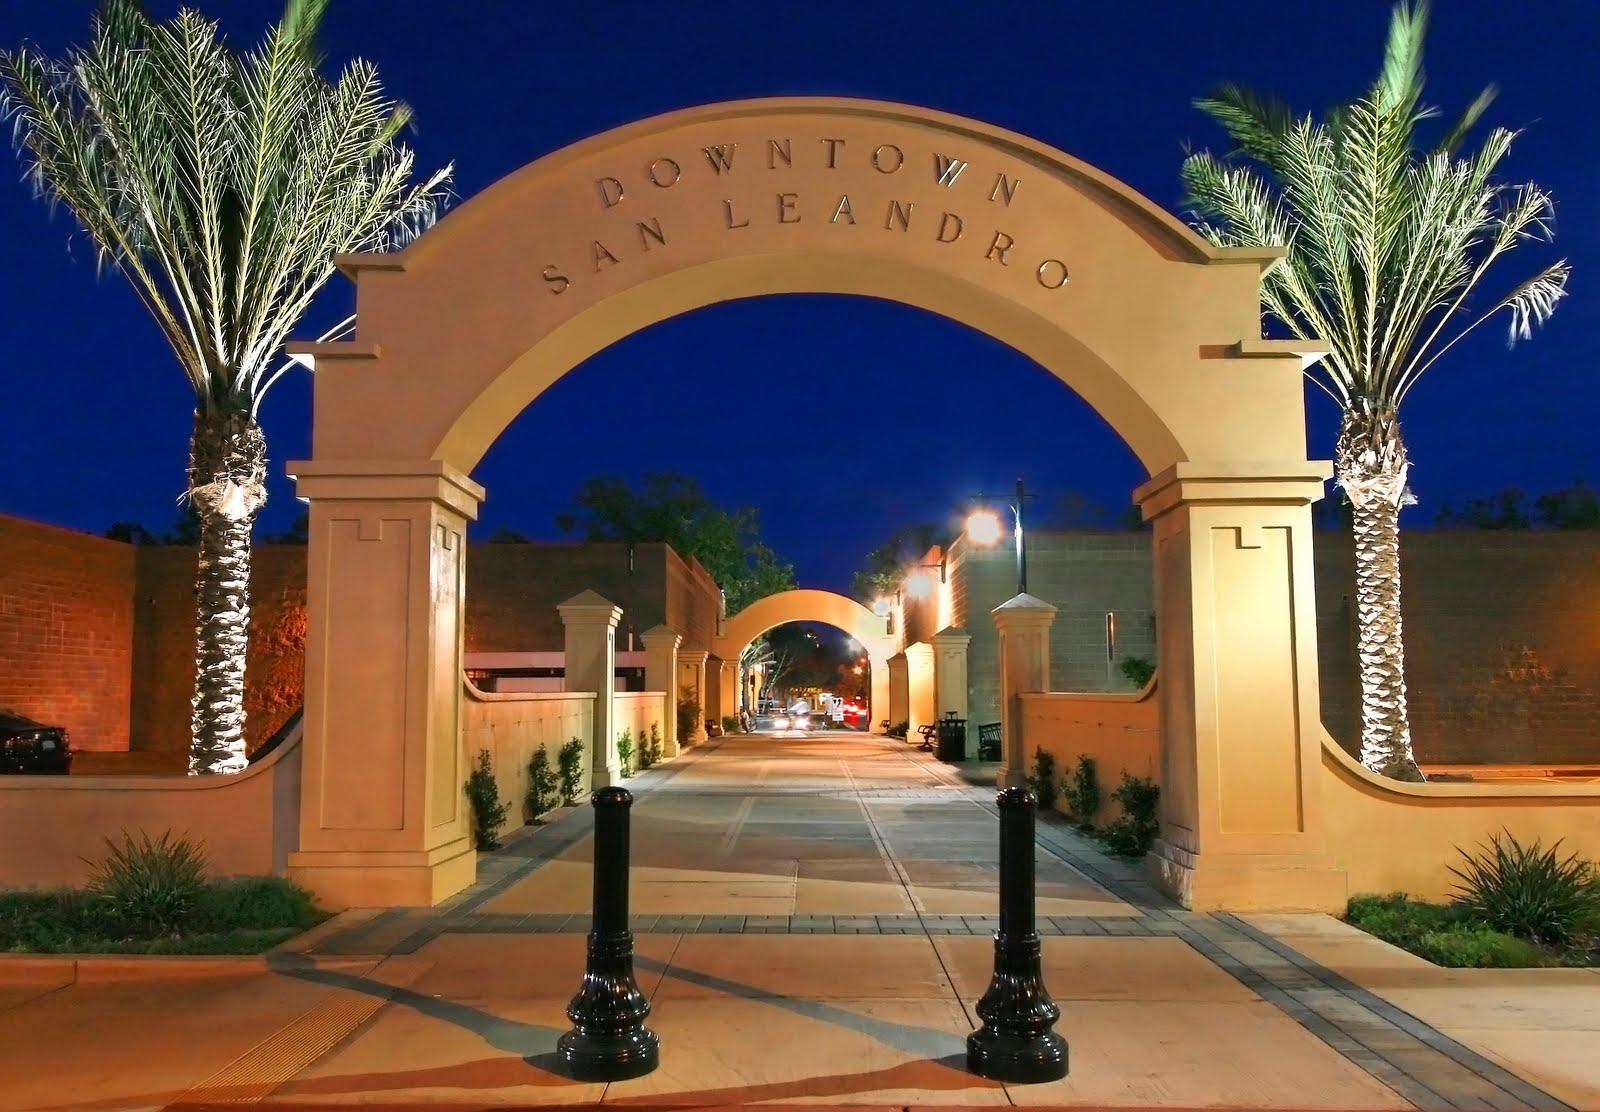 City Of San Leandro >> City Of San Leandro History Of The City Of San Leandro